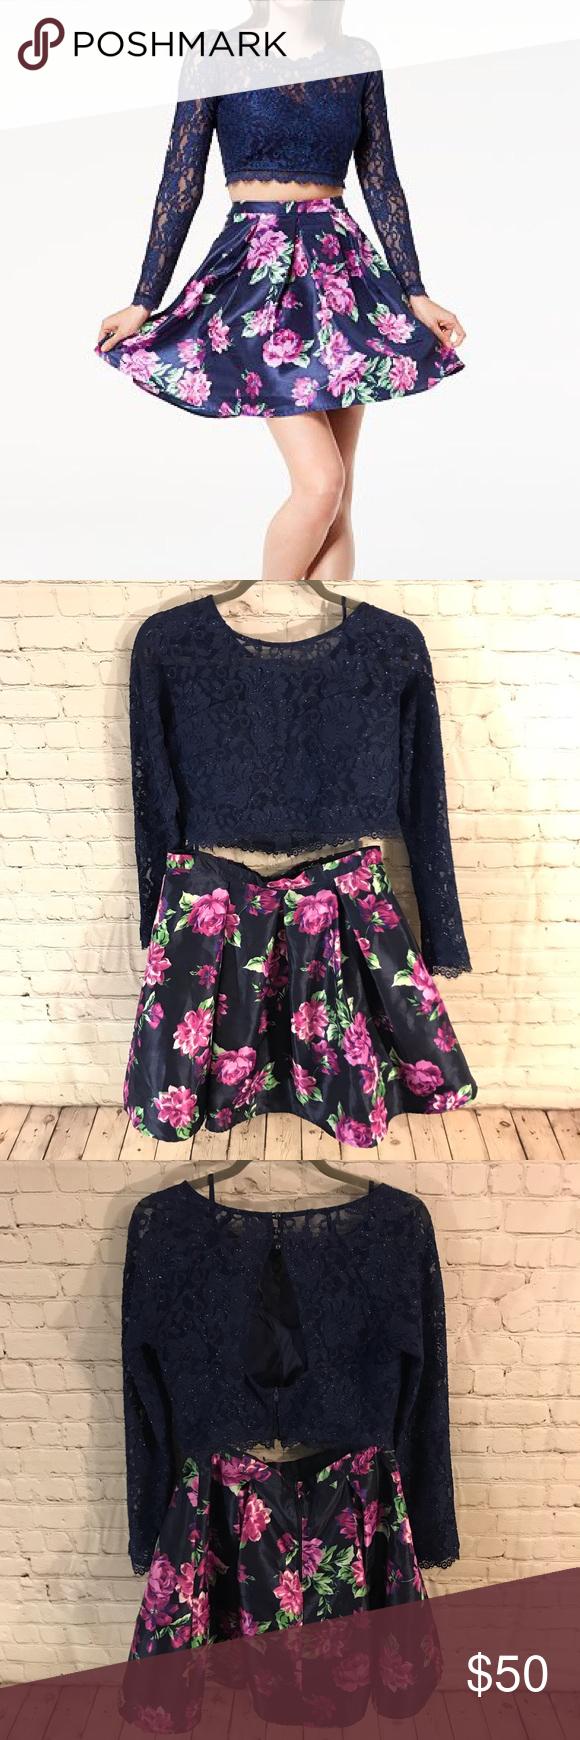 Sequin Hearts 2 Piece Dress Piece Dress Fit Flare Dress Lace Crop Tops